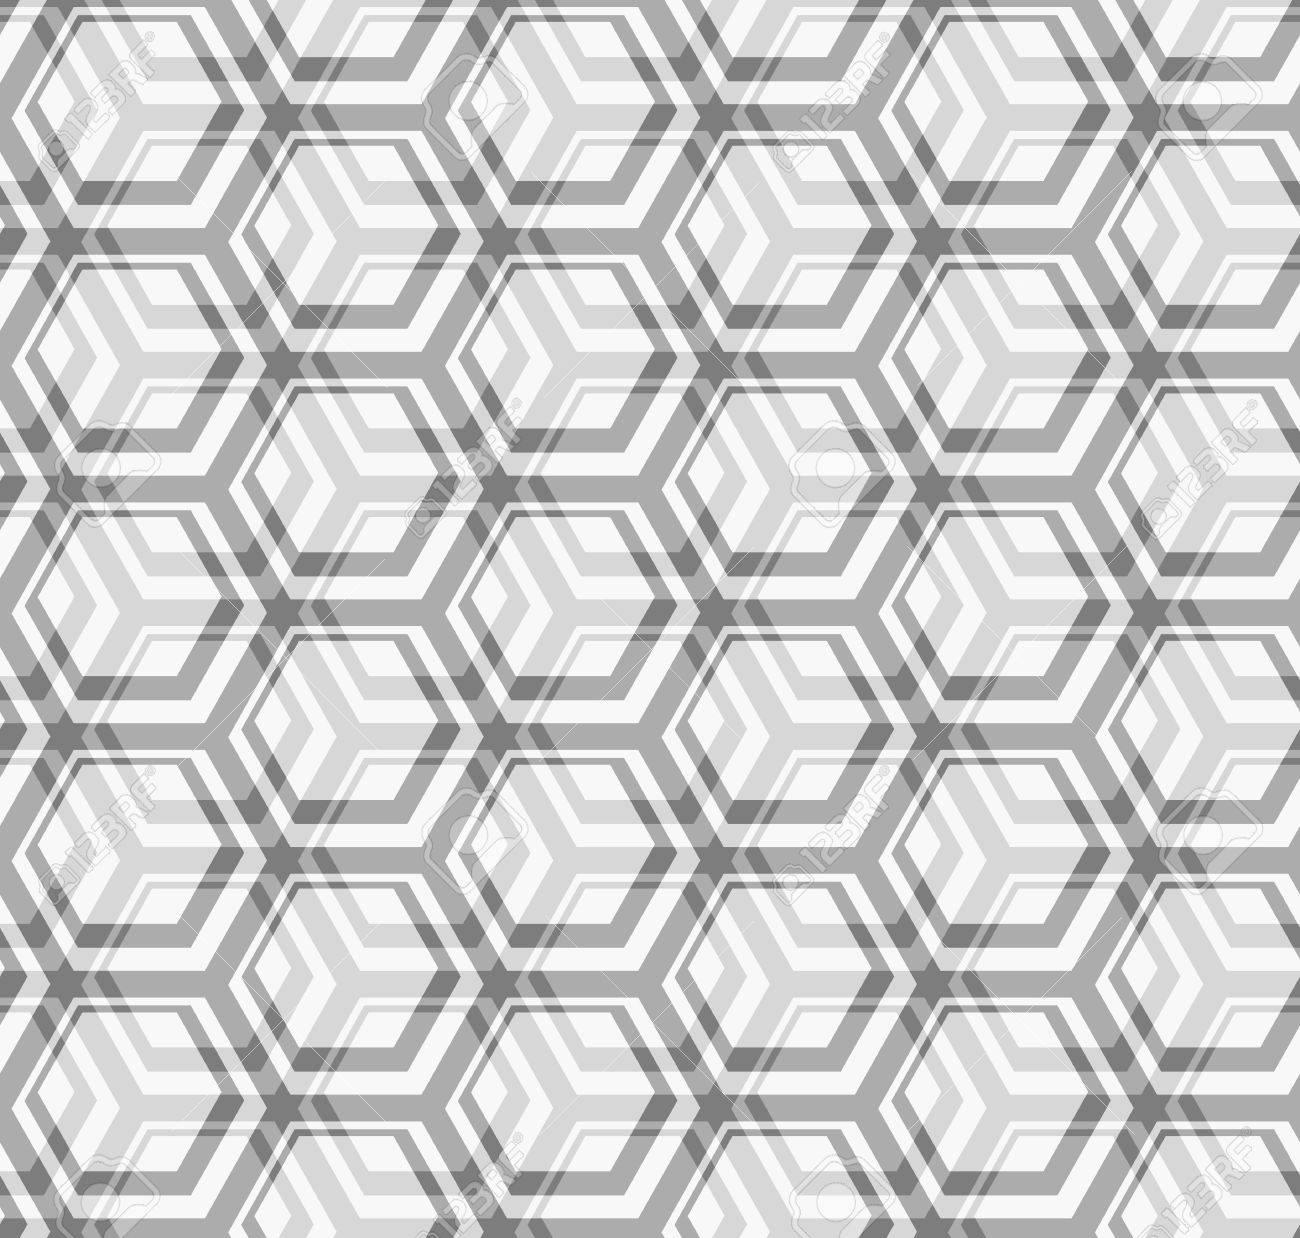 Seamless vector texture - the intersection of gray hexagons Stock Vector - 13980091